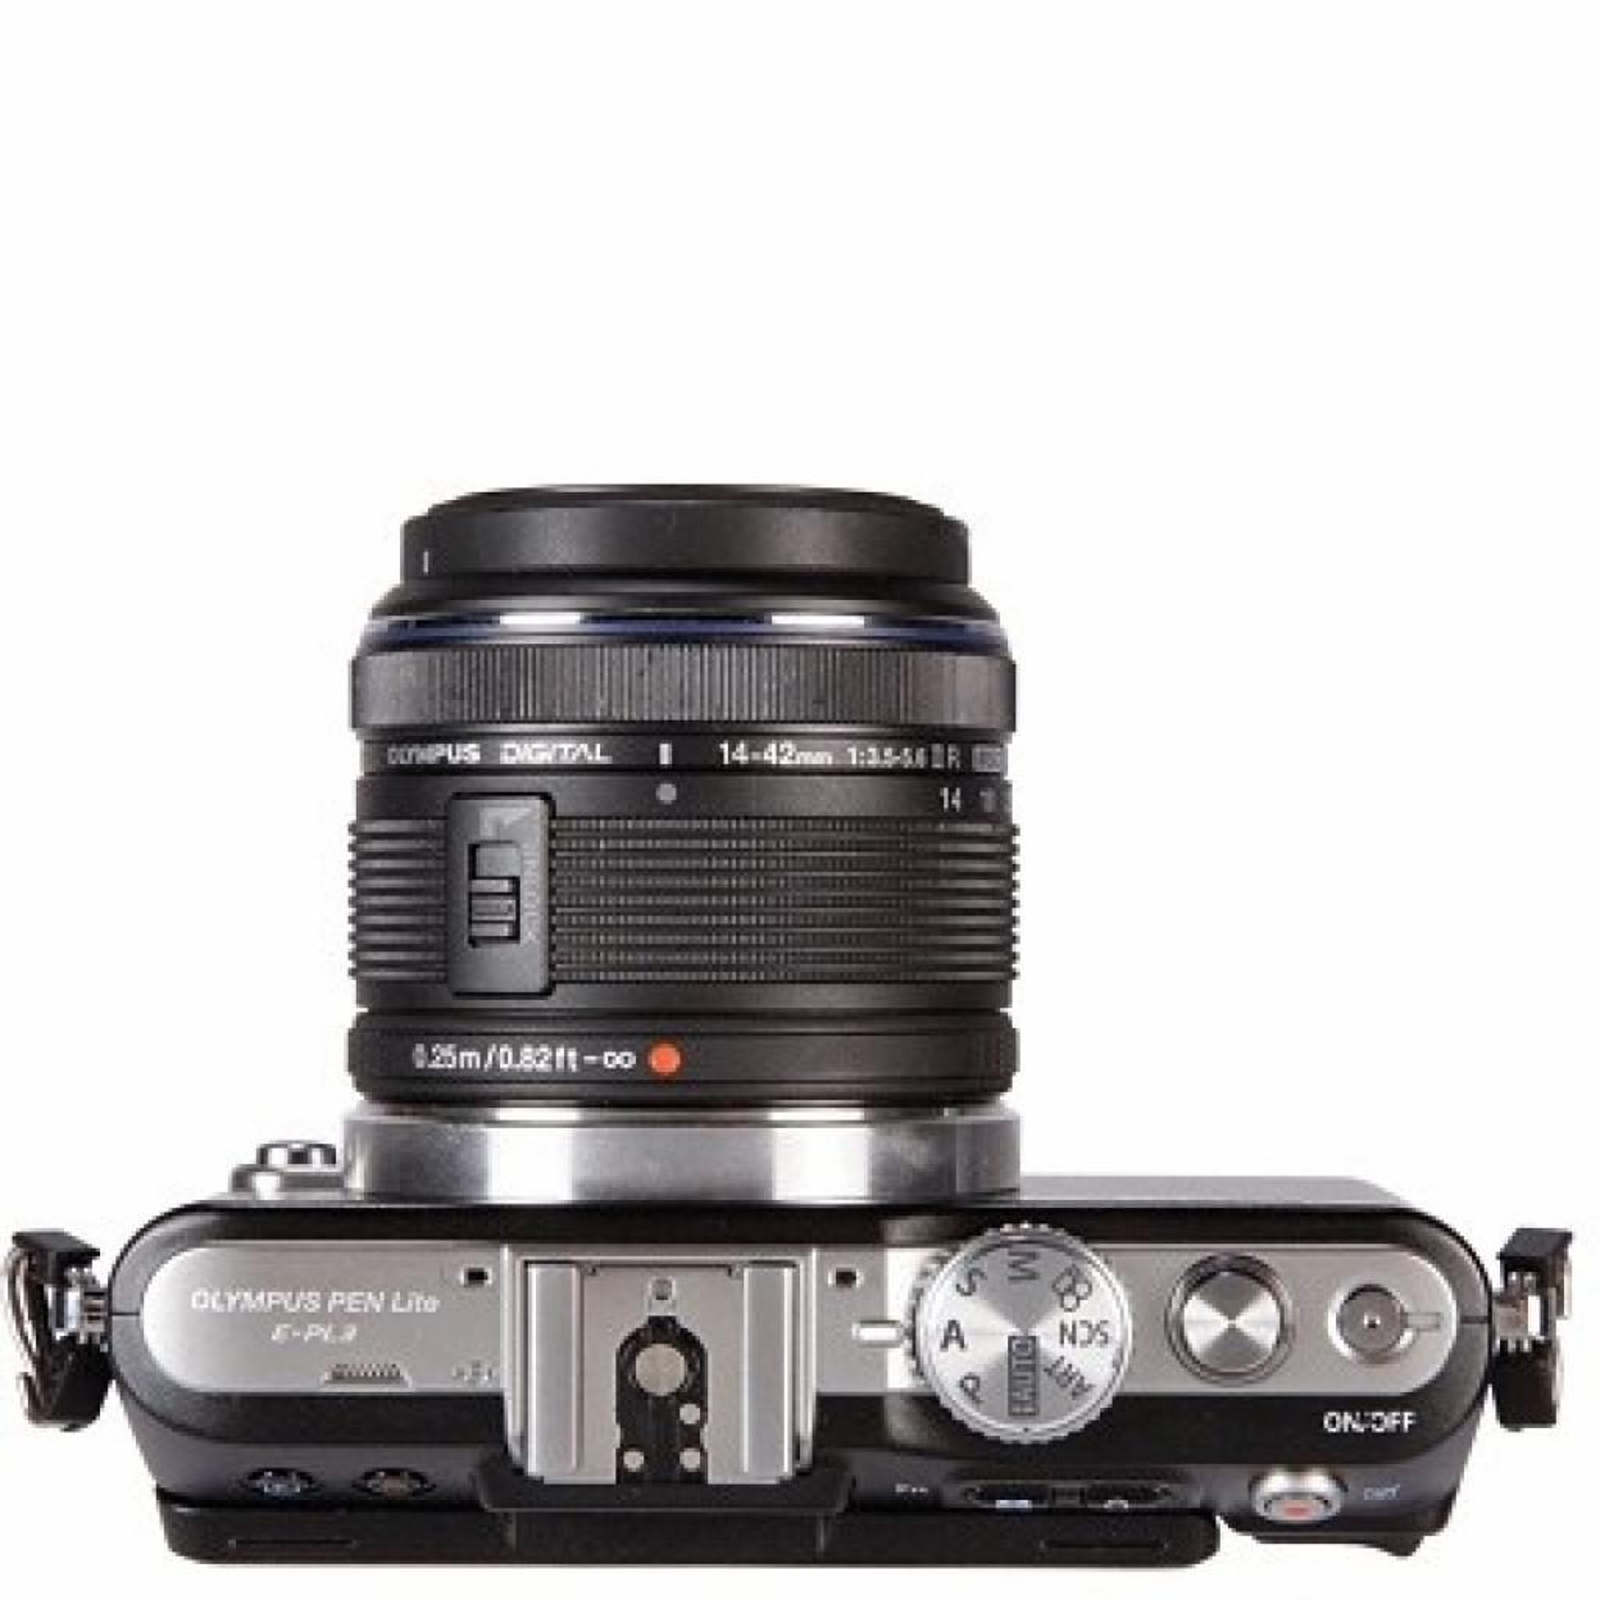 Цифровой фотоаппарат OLYMPUS PEN E-PL3 14-42 mm kit black/black (V20503BBE000/V205031BE000) изображение 3